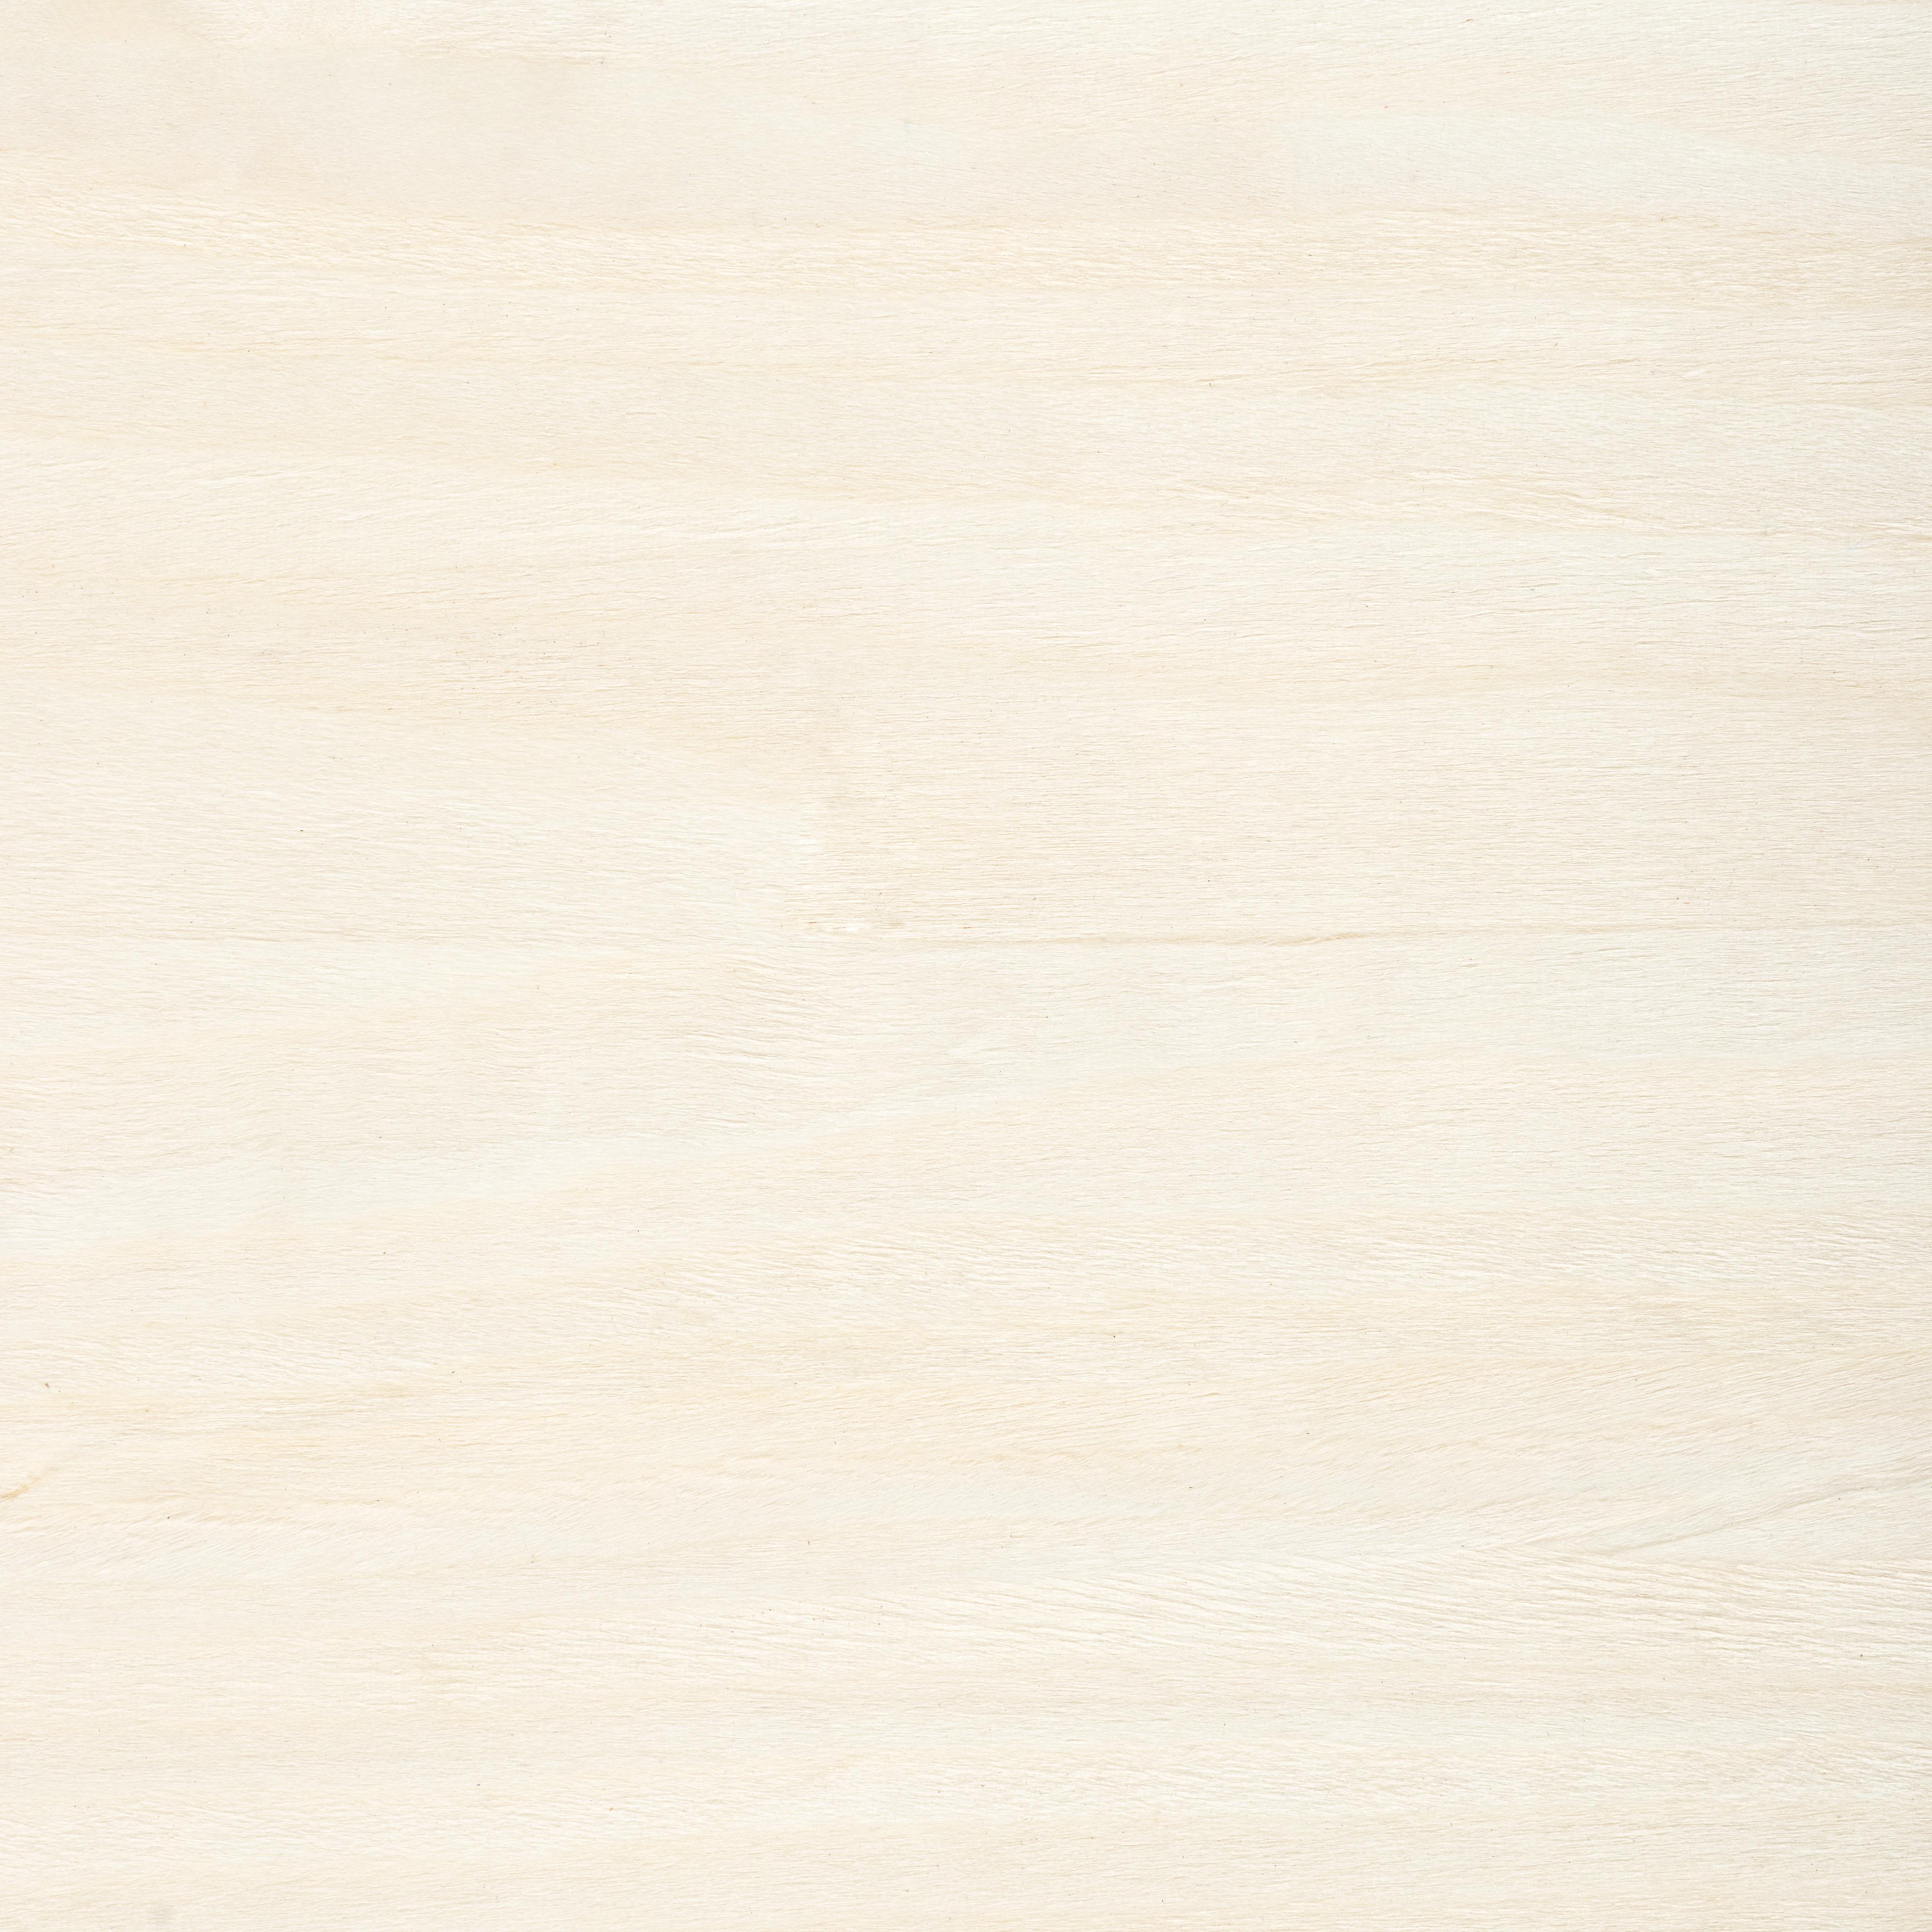 Birch Wood Grain Texture | WallpaperHDC.com